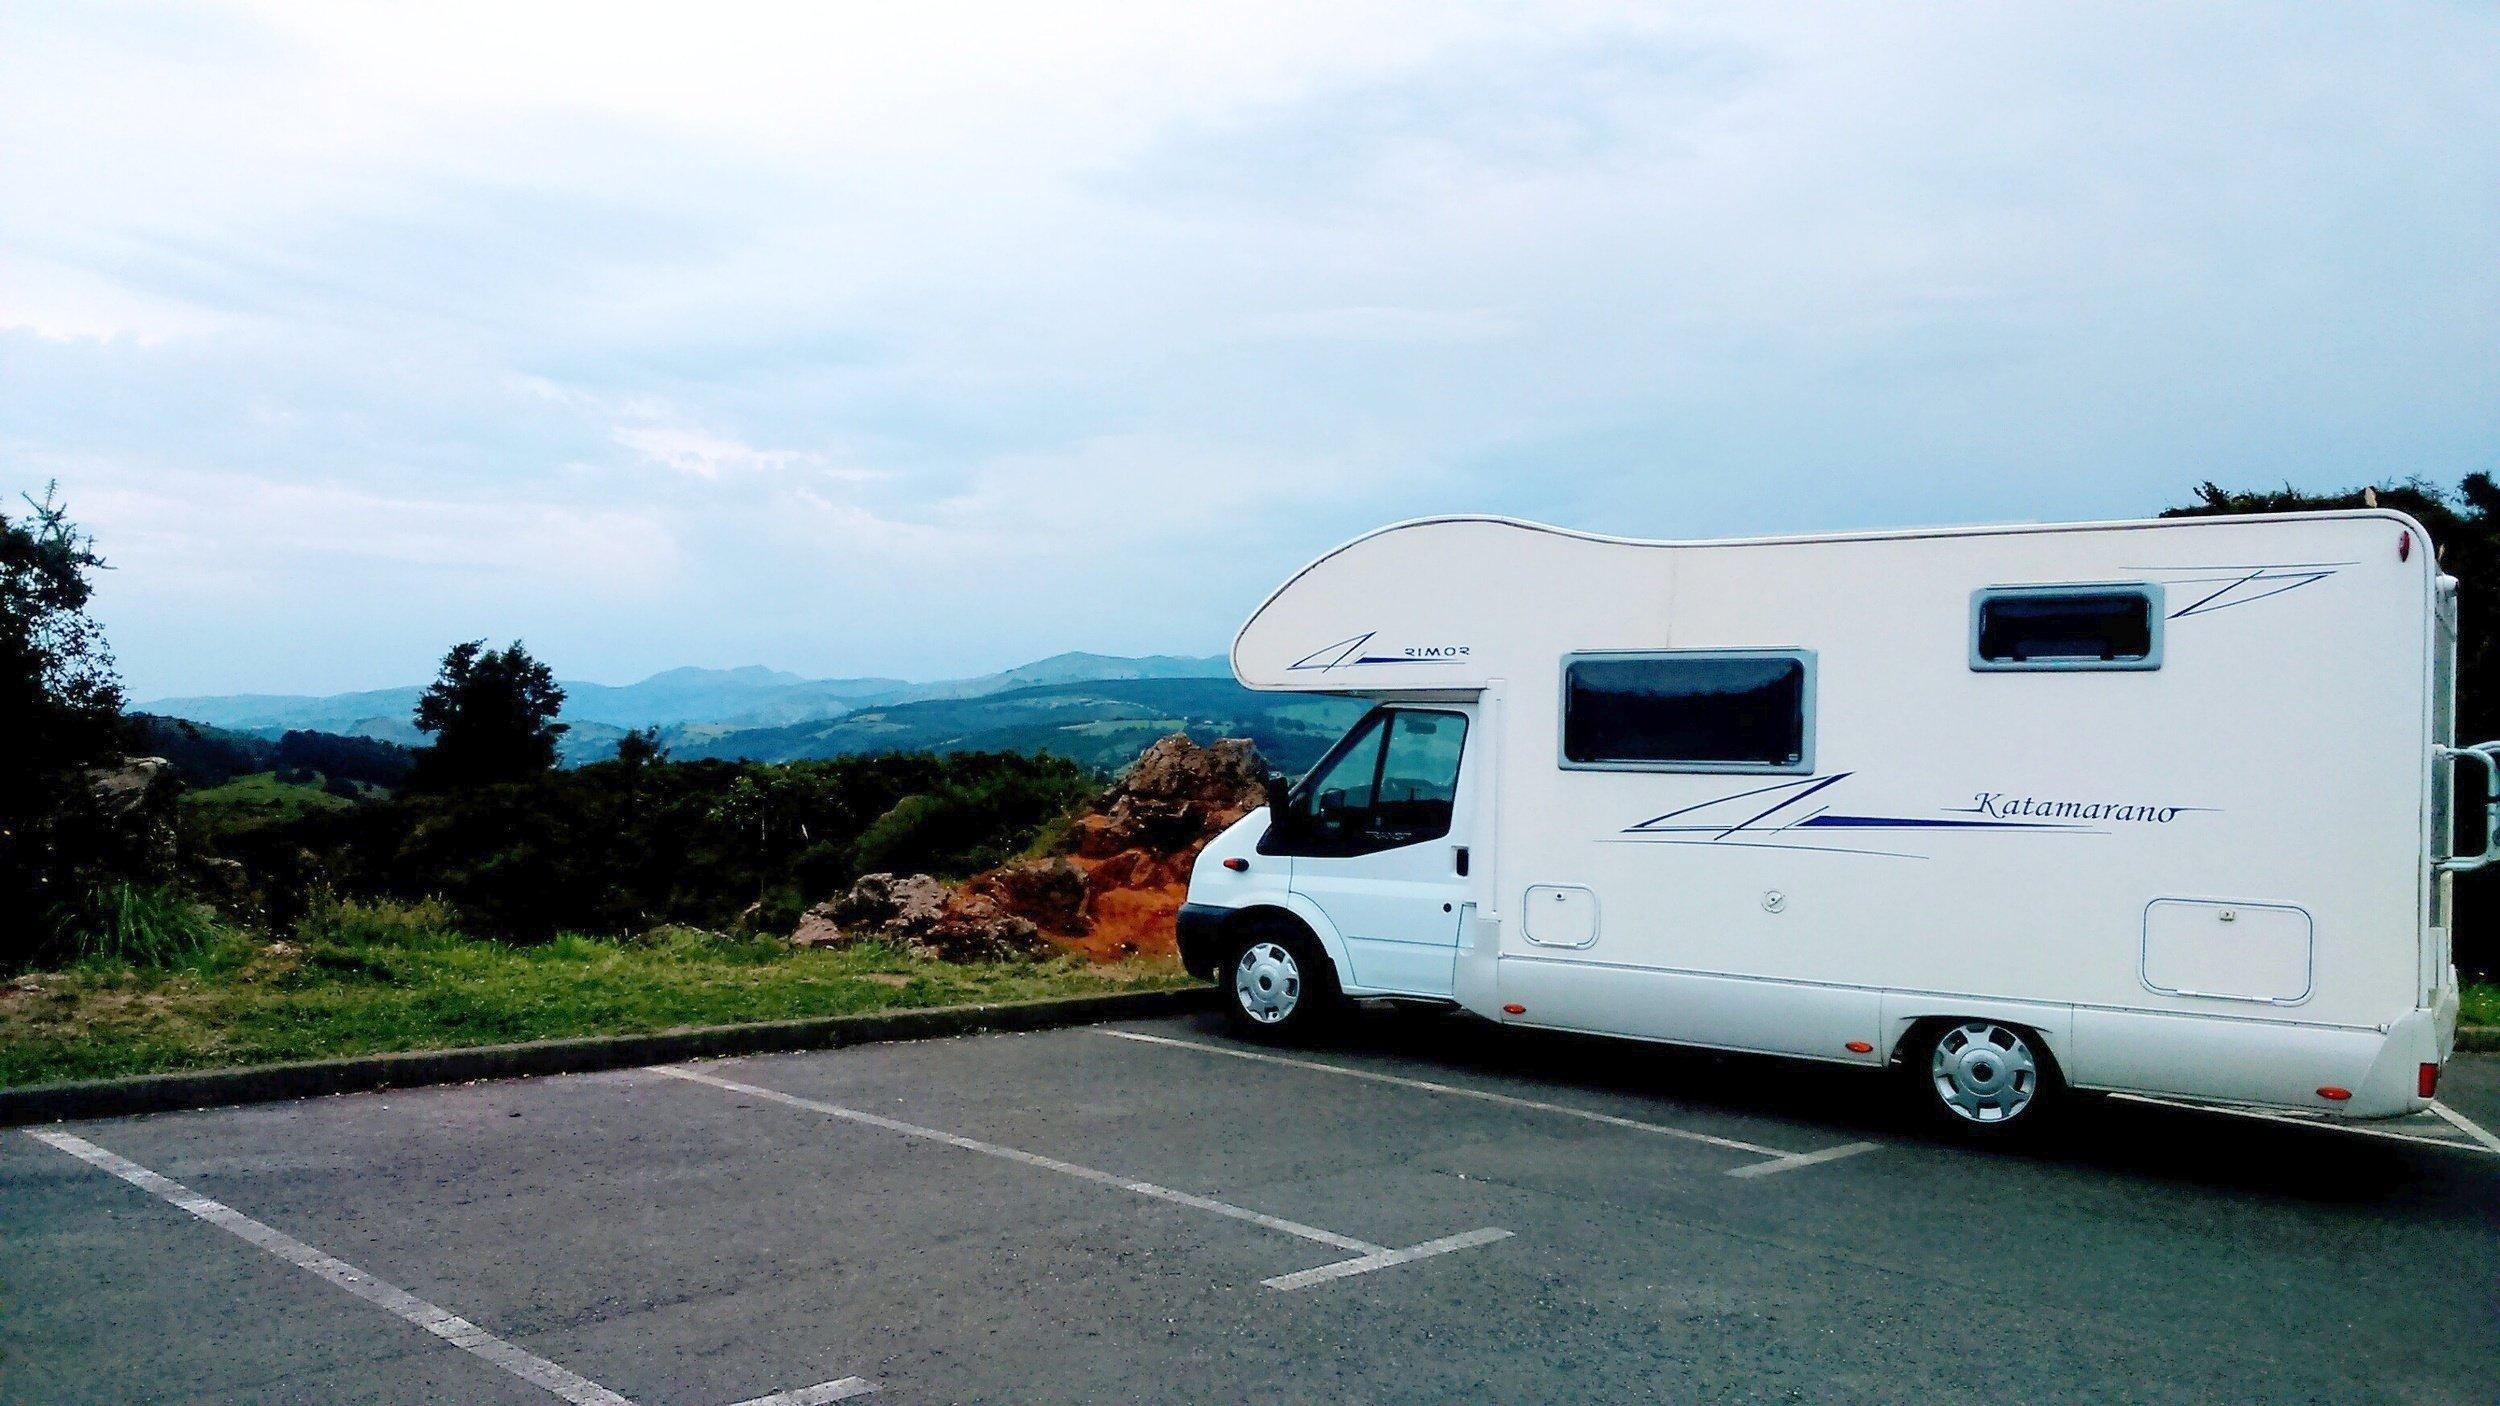 Alquiler de Autocaravanas y Furgonetas camper - Pamplona | Yescapa